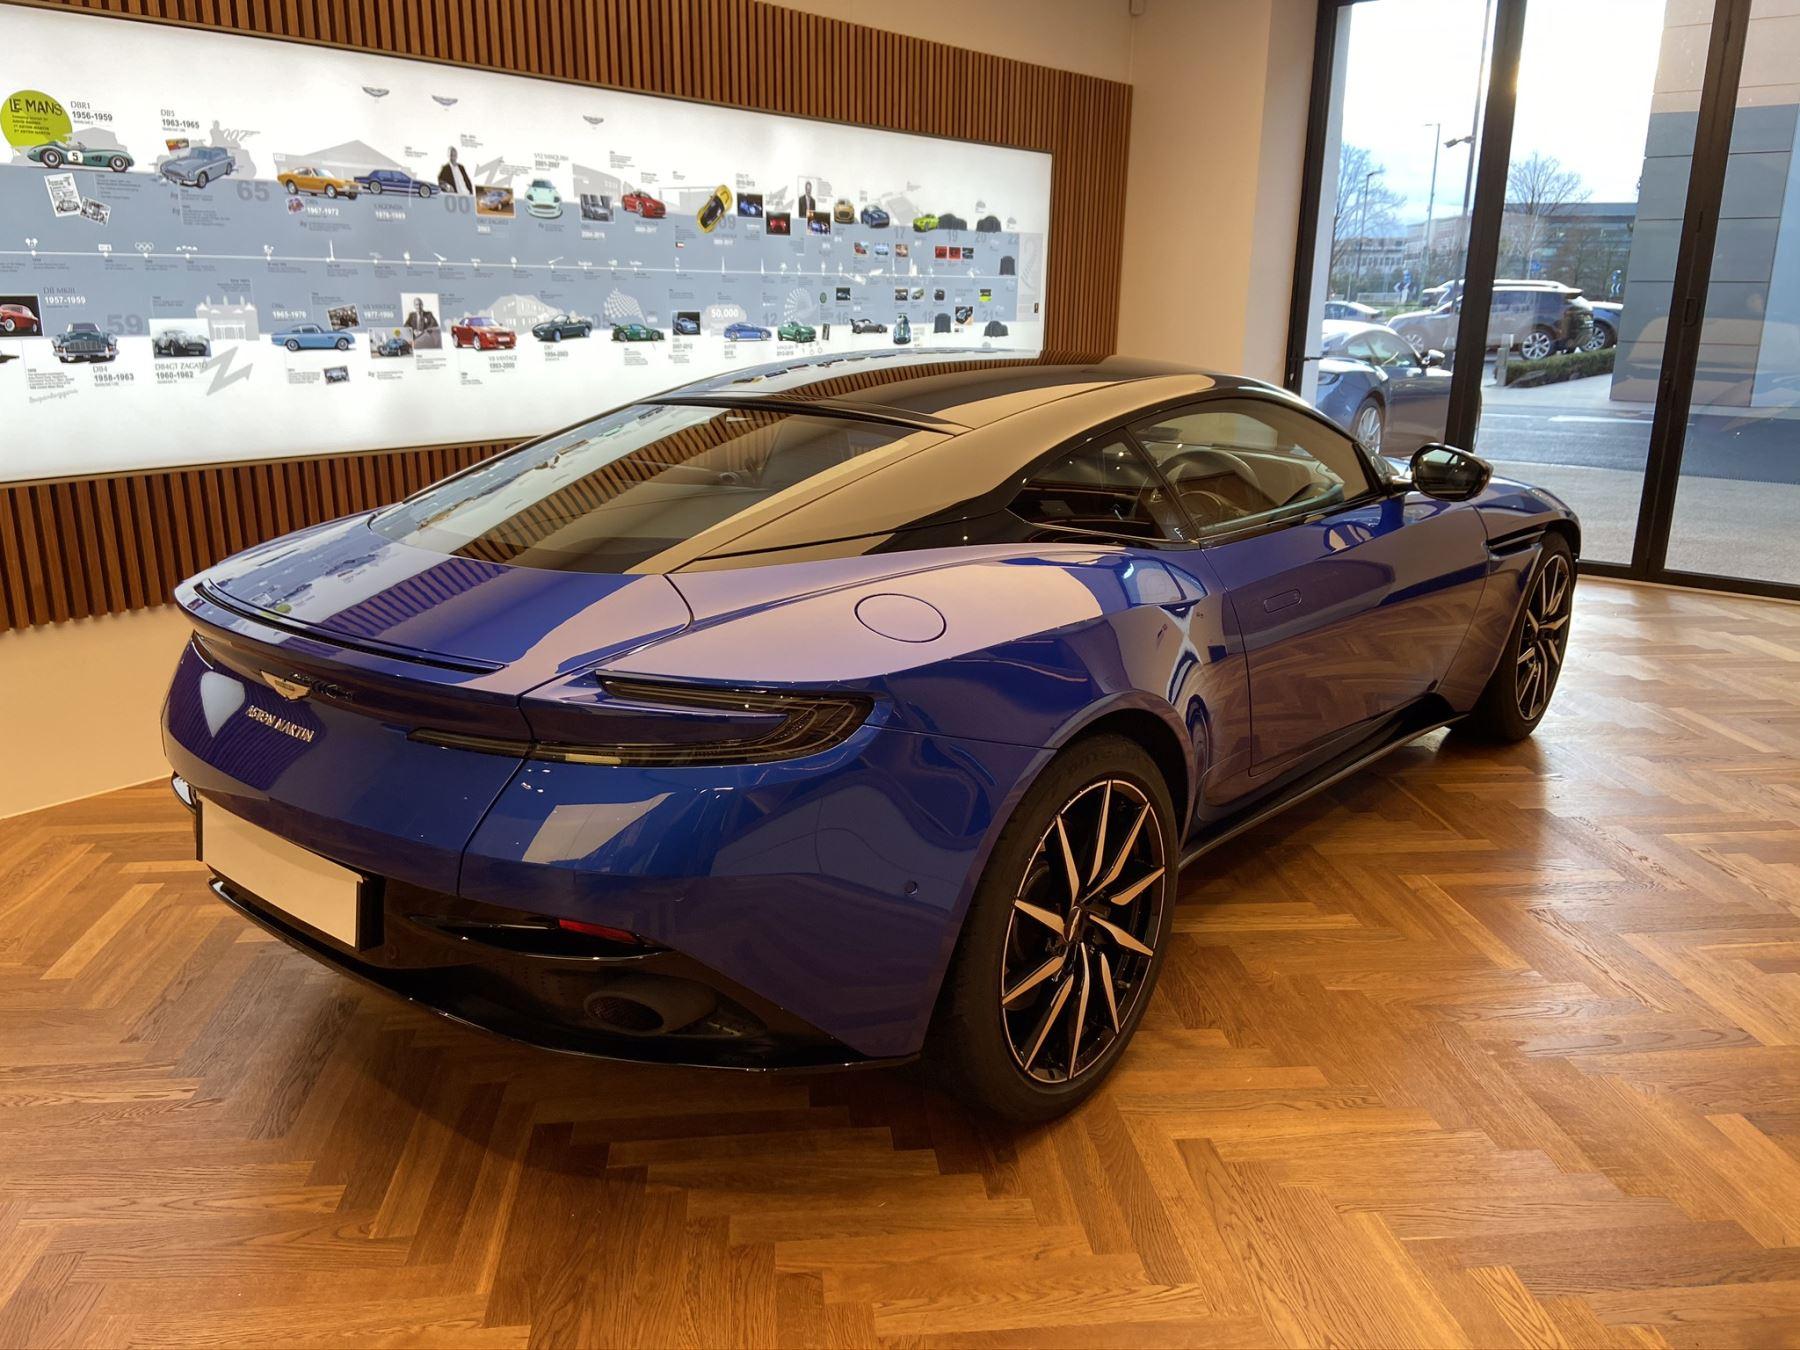 Aston Martin DB11 V8 2dr Touchtronic image 2